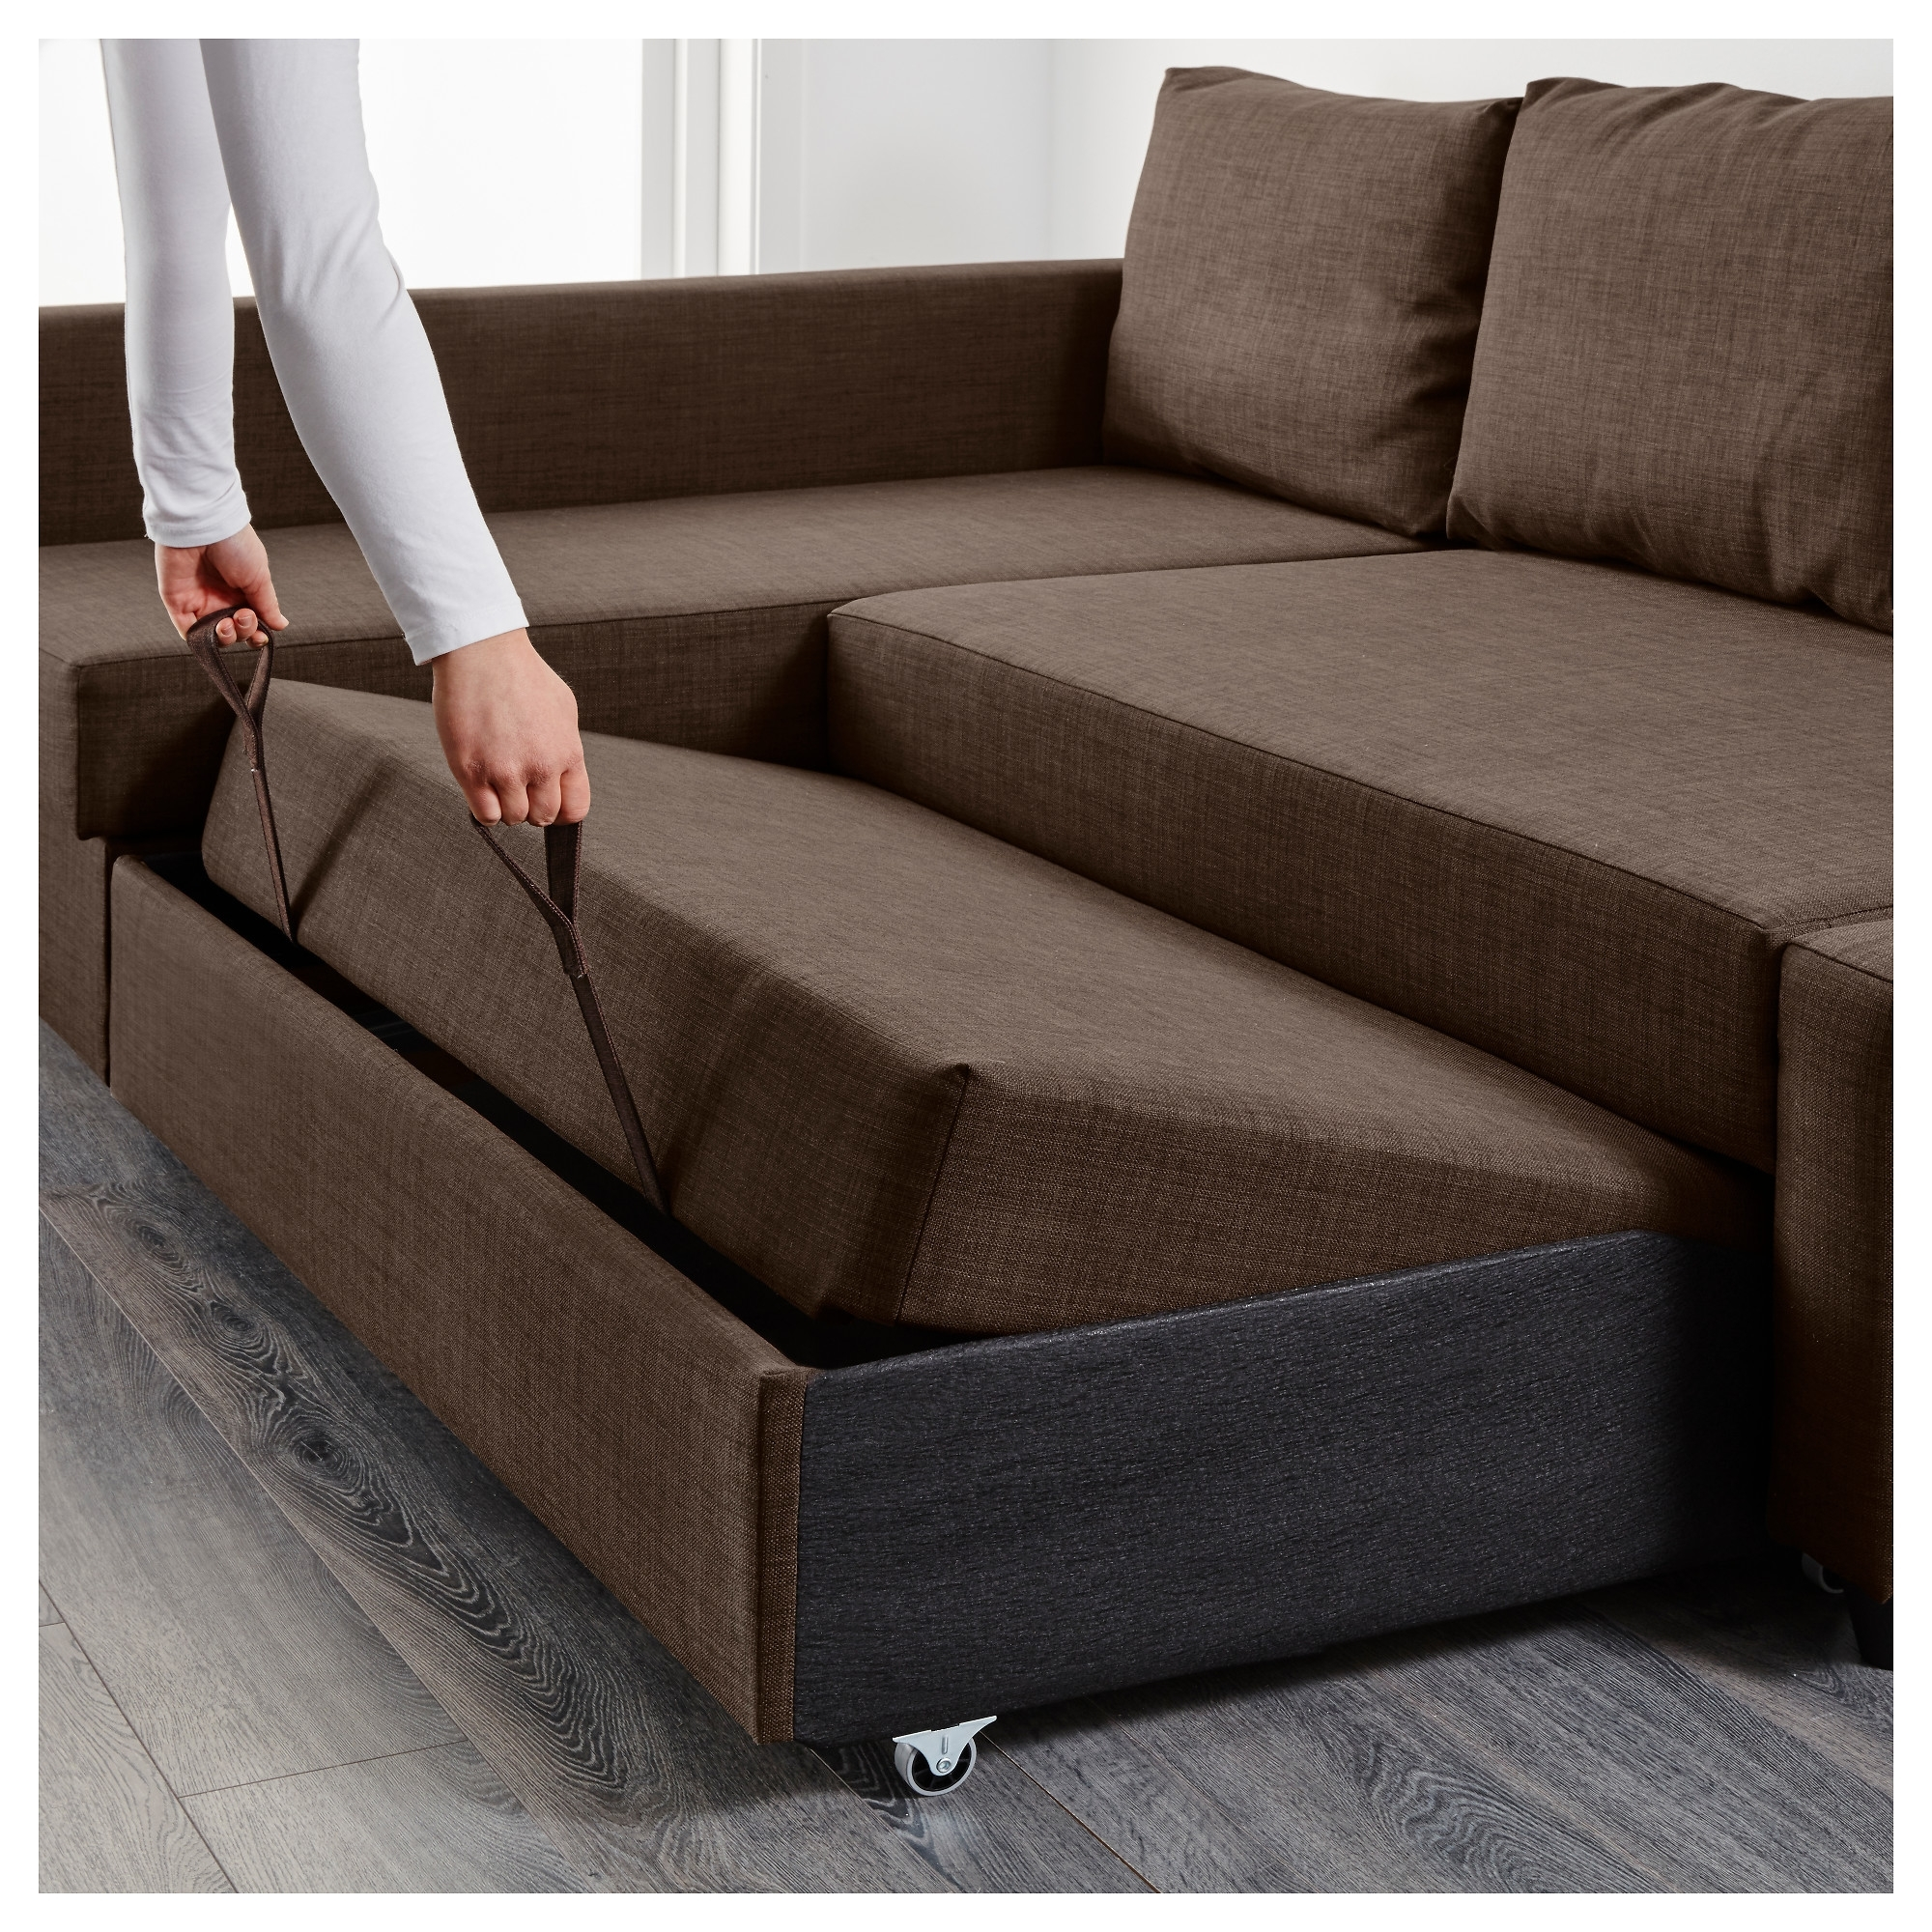 Friheten Sleeper Sectional,3 Seat W/storage – Skiftebo Dark Gray – Ikea Inside Ikea Sectional Sleeper Sofas (View 4 of 10)